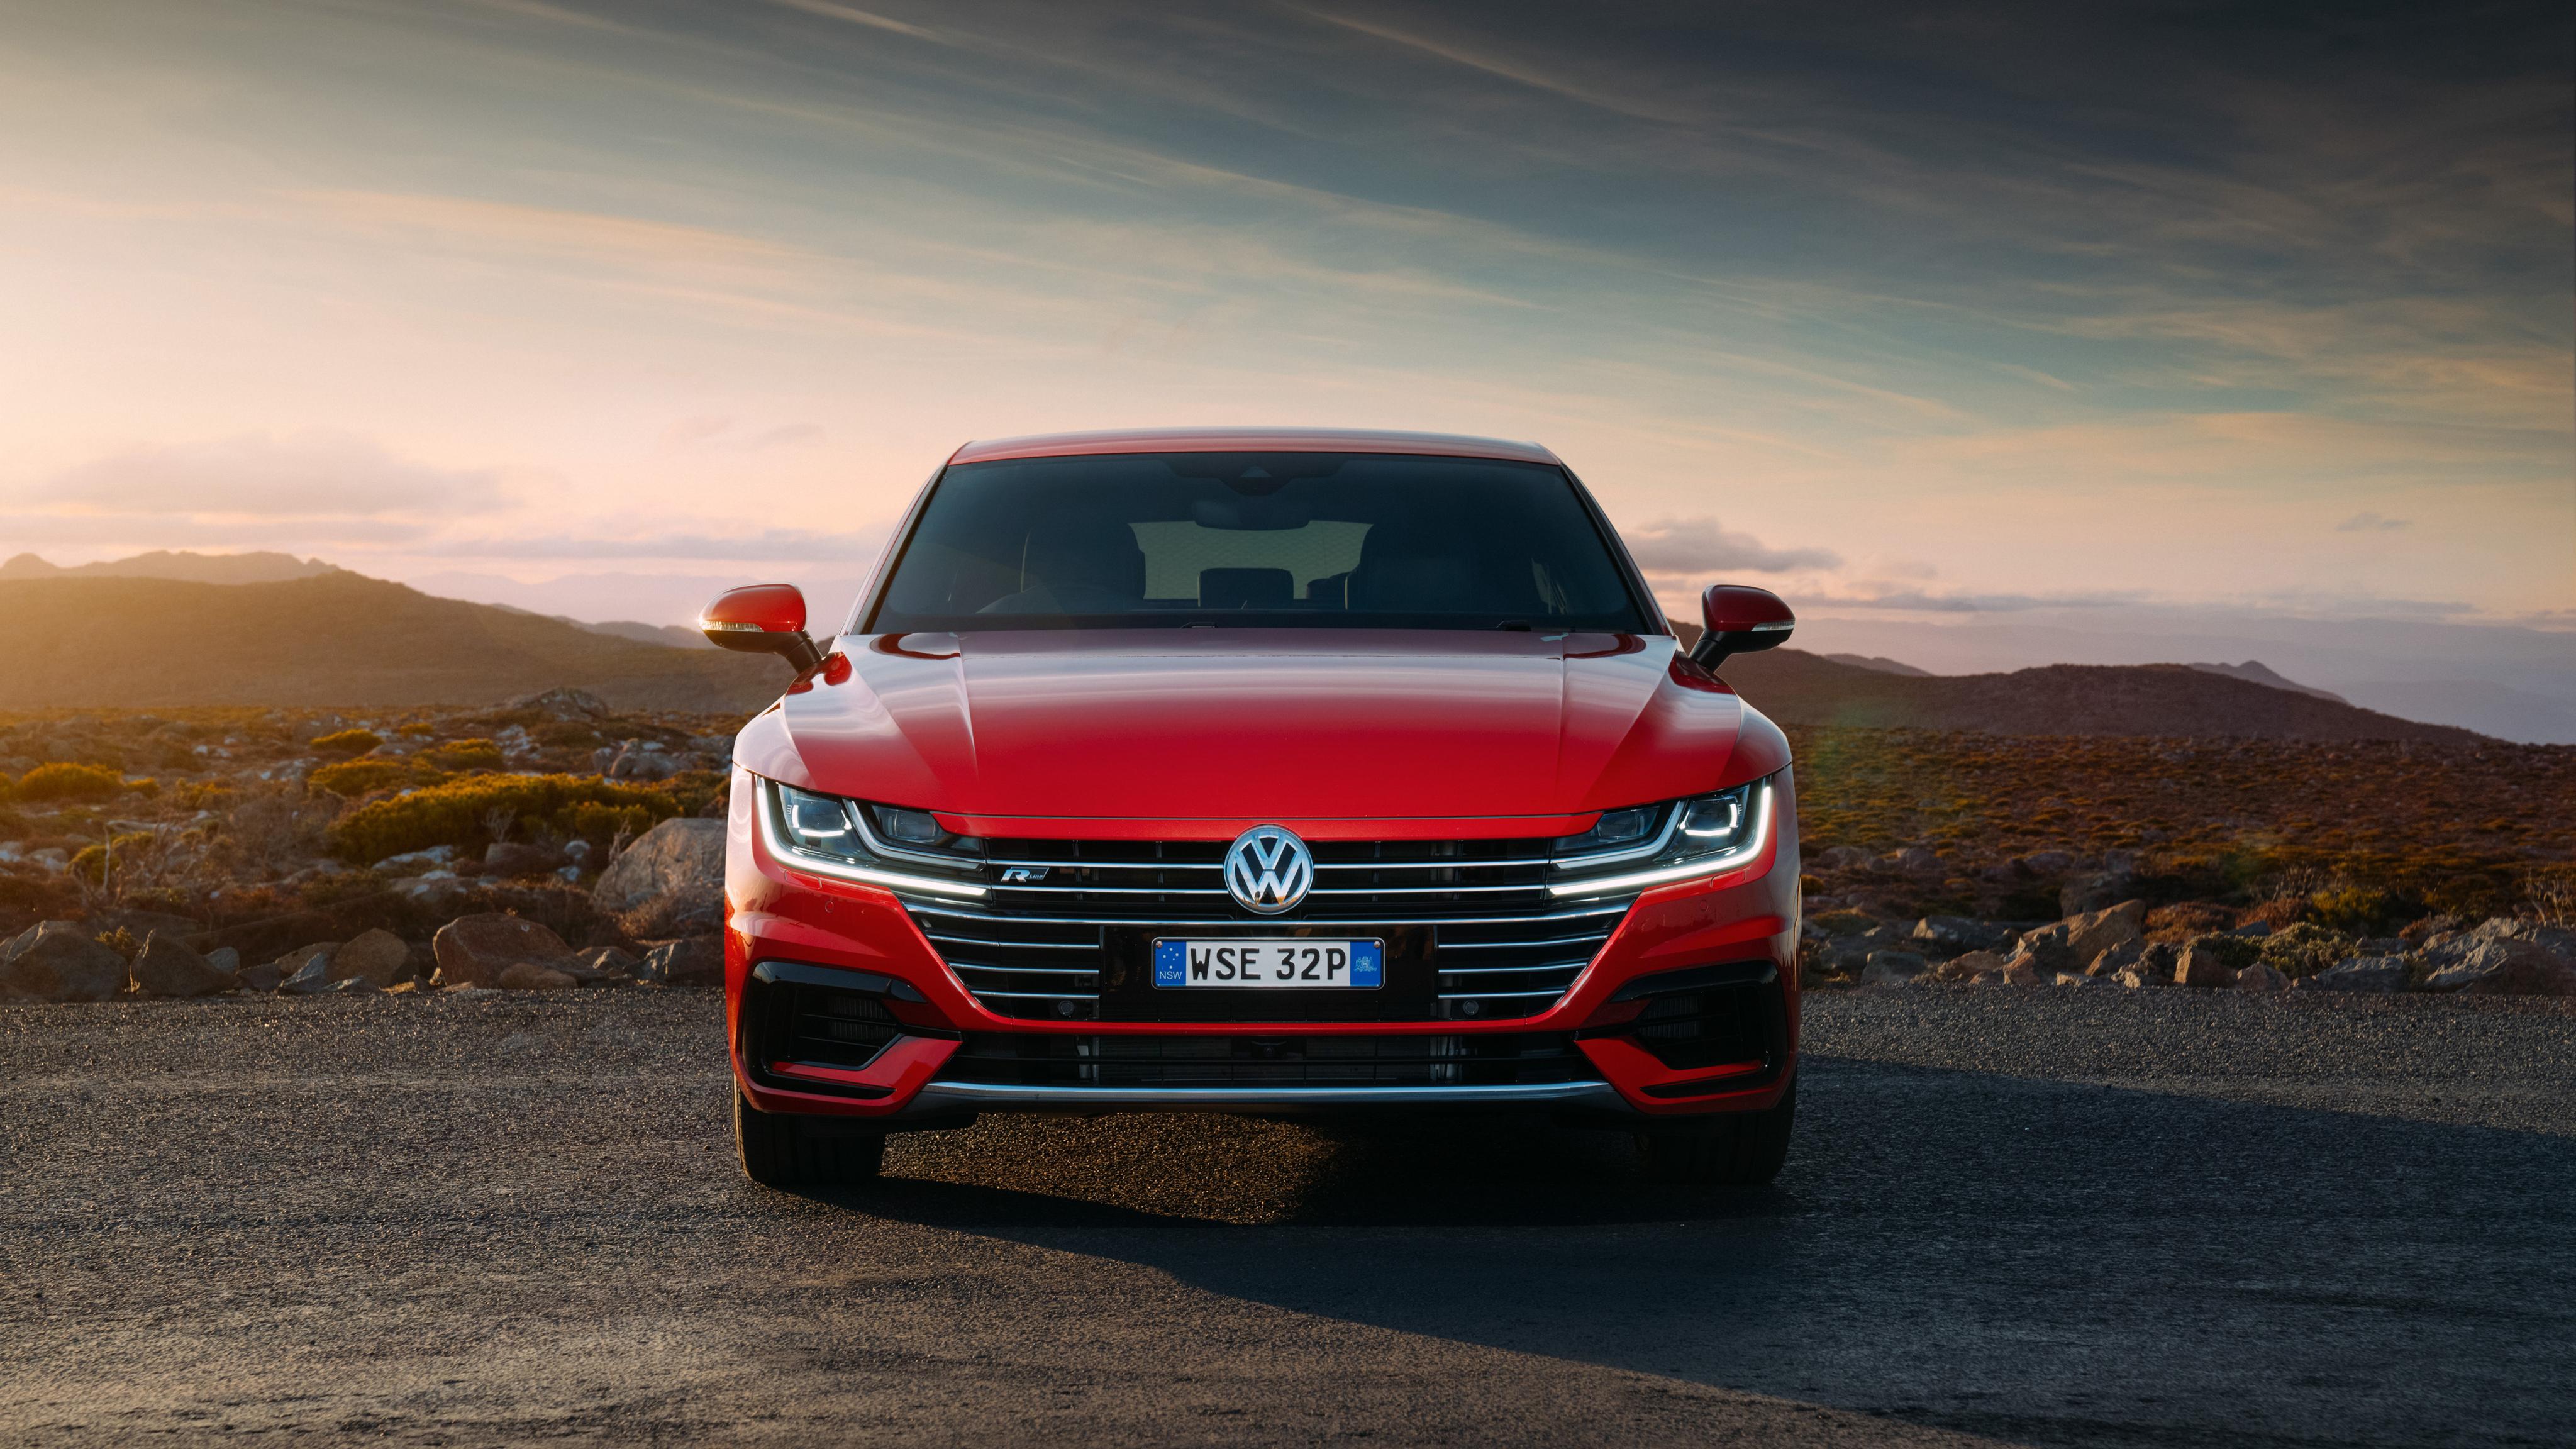 Volkswagen Arteon 4motion R Line 4k 2018 2 Wallpaper Hd